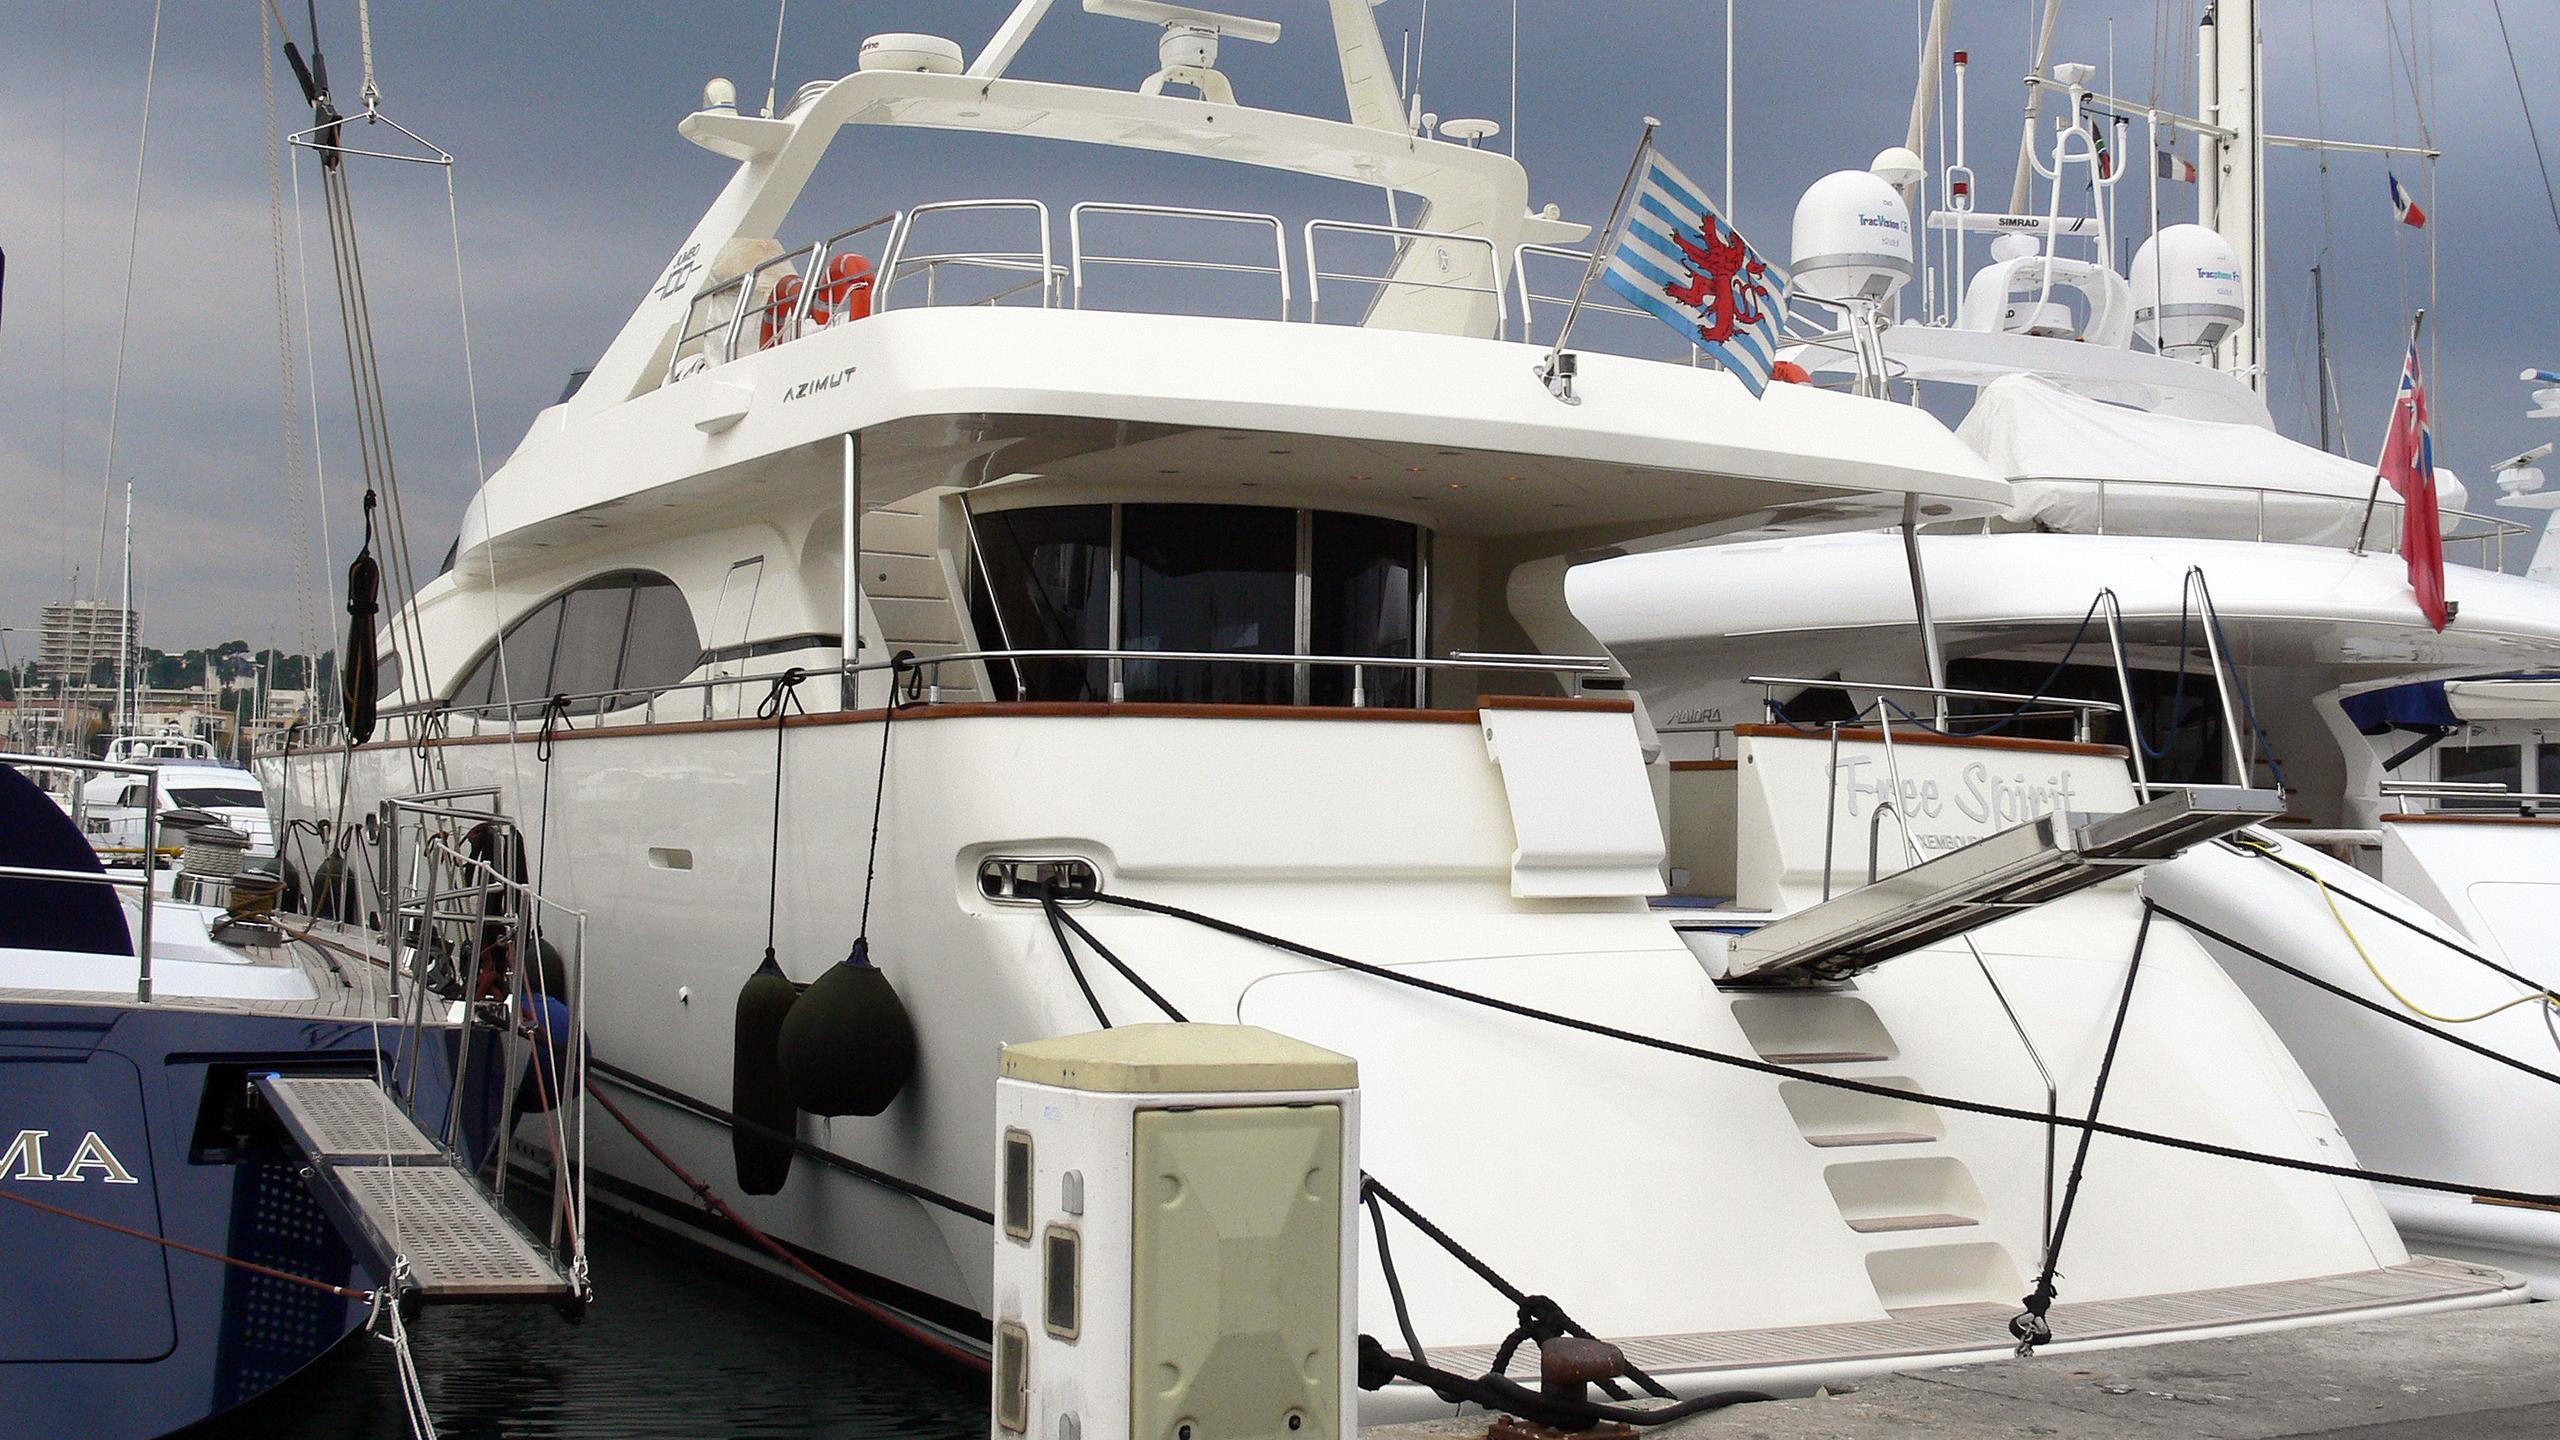 free-spirit-motor-yacht-azimut-100-jumbo-2003-30m-stern